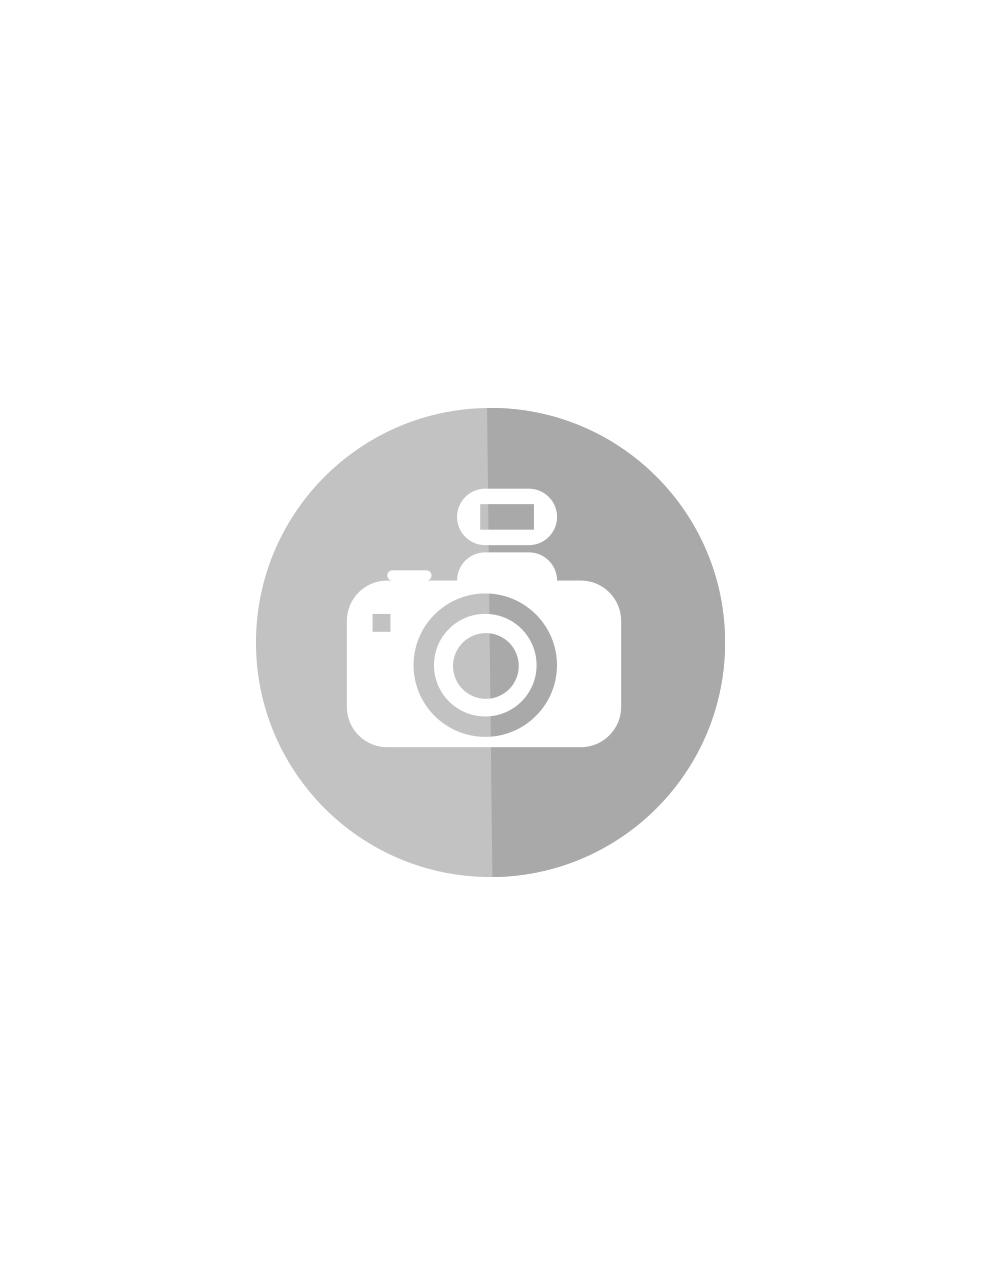 category_image_MONATSAKTION